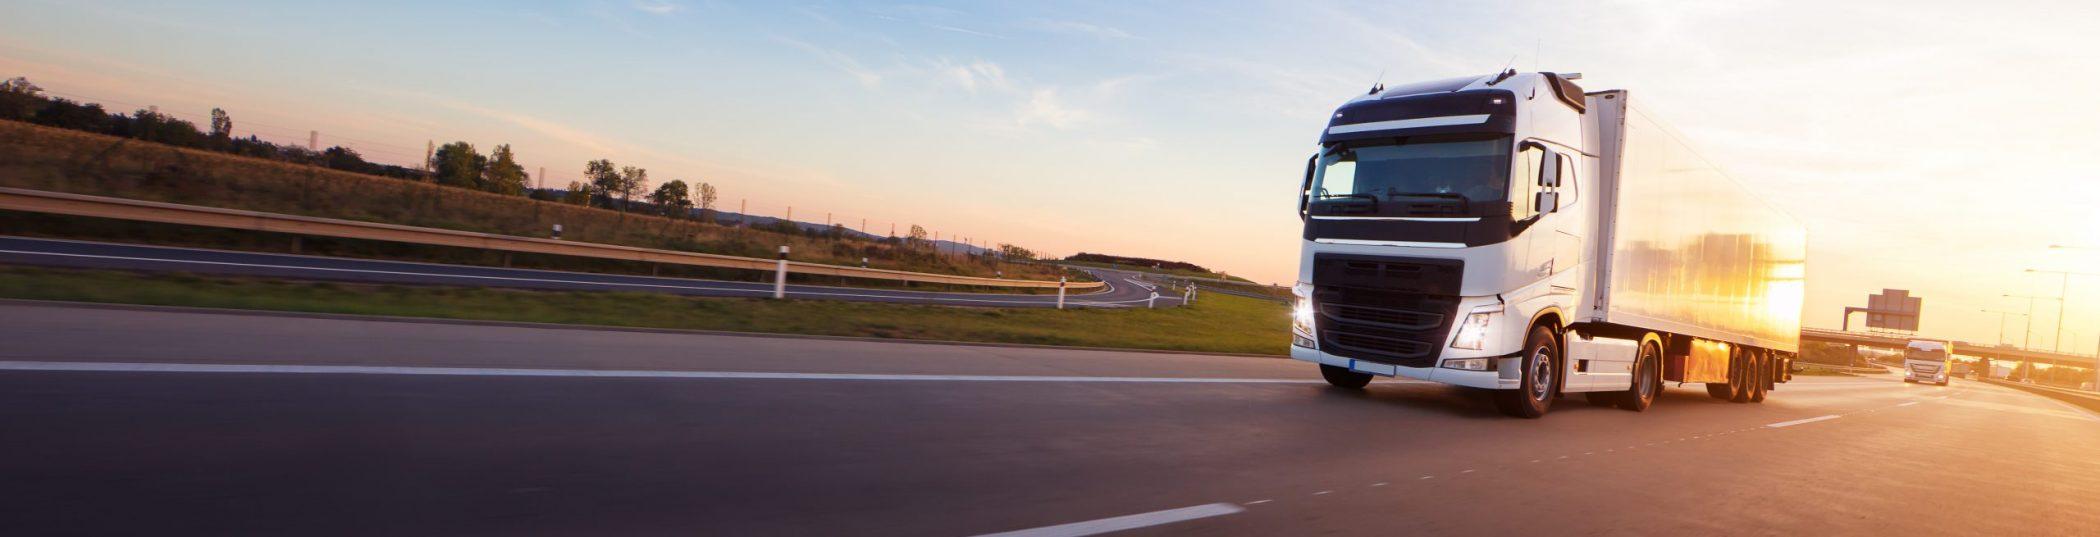 Loaded,European,Truck,On,Motorway,In,Beautiful,Sunset,Light.,On